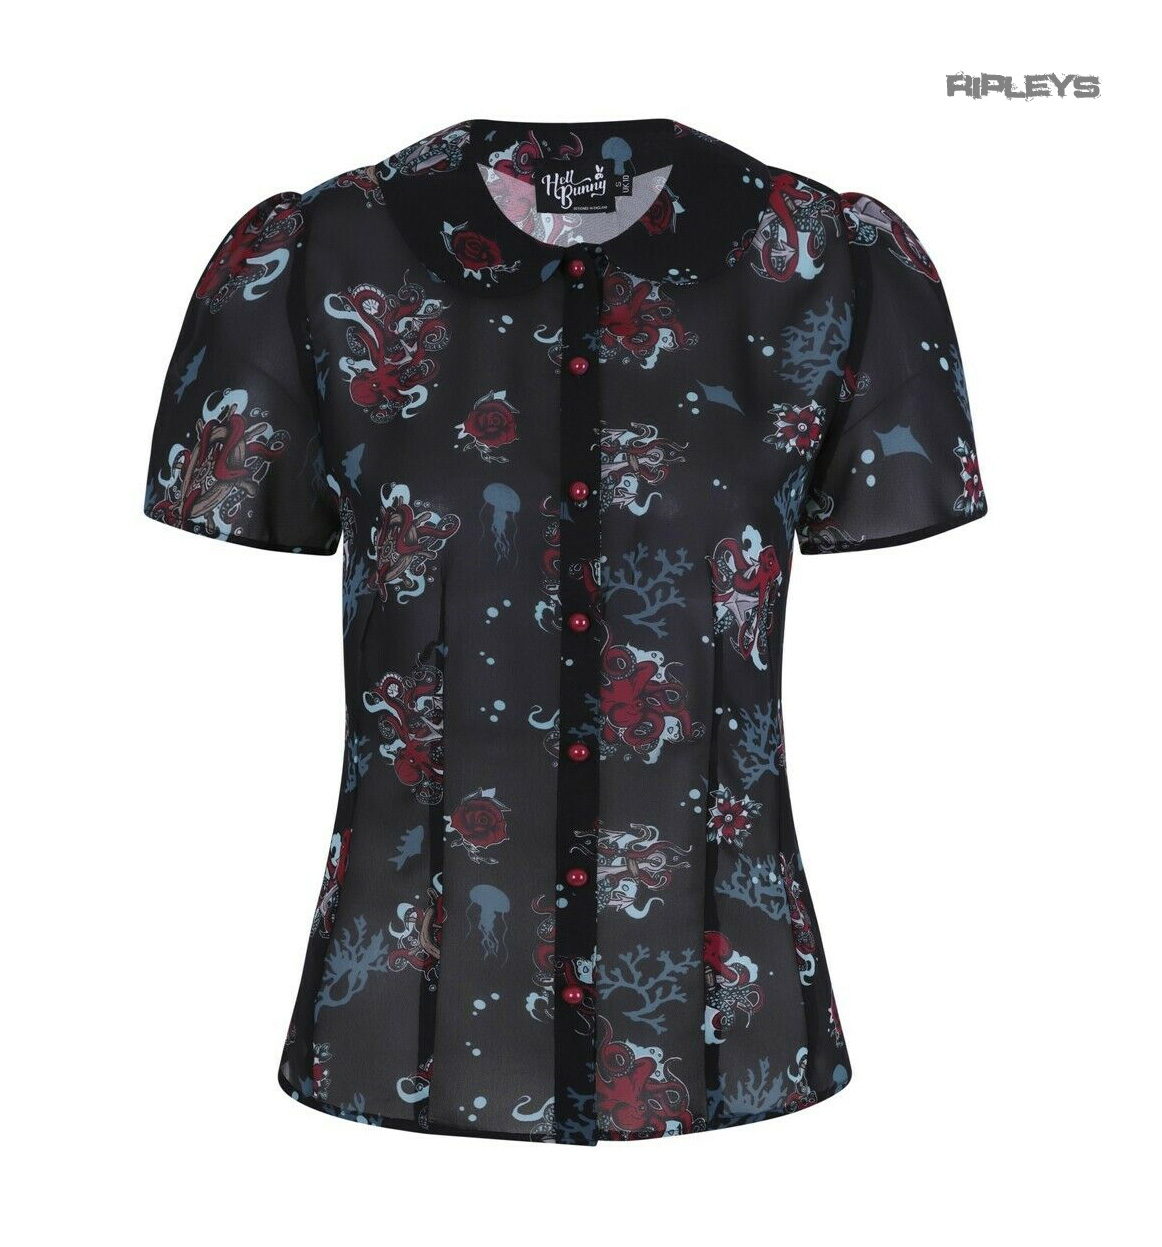 Hell-Bunny-50s-Shirt-Top-Black-Ocean-Octopus-Roses-POSEIDON-Blouse-All-Sizes thumbnail 10